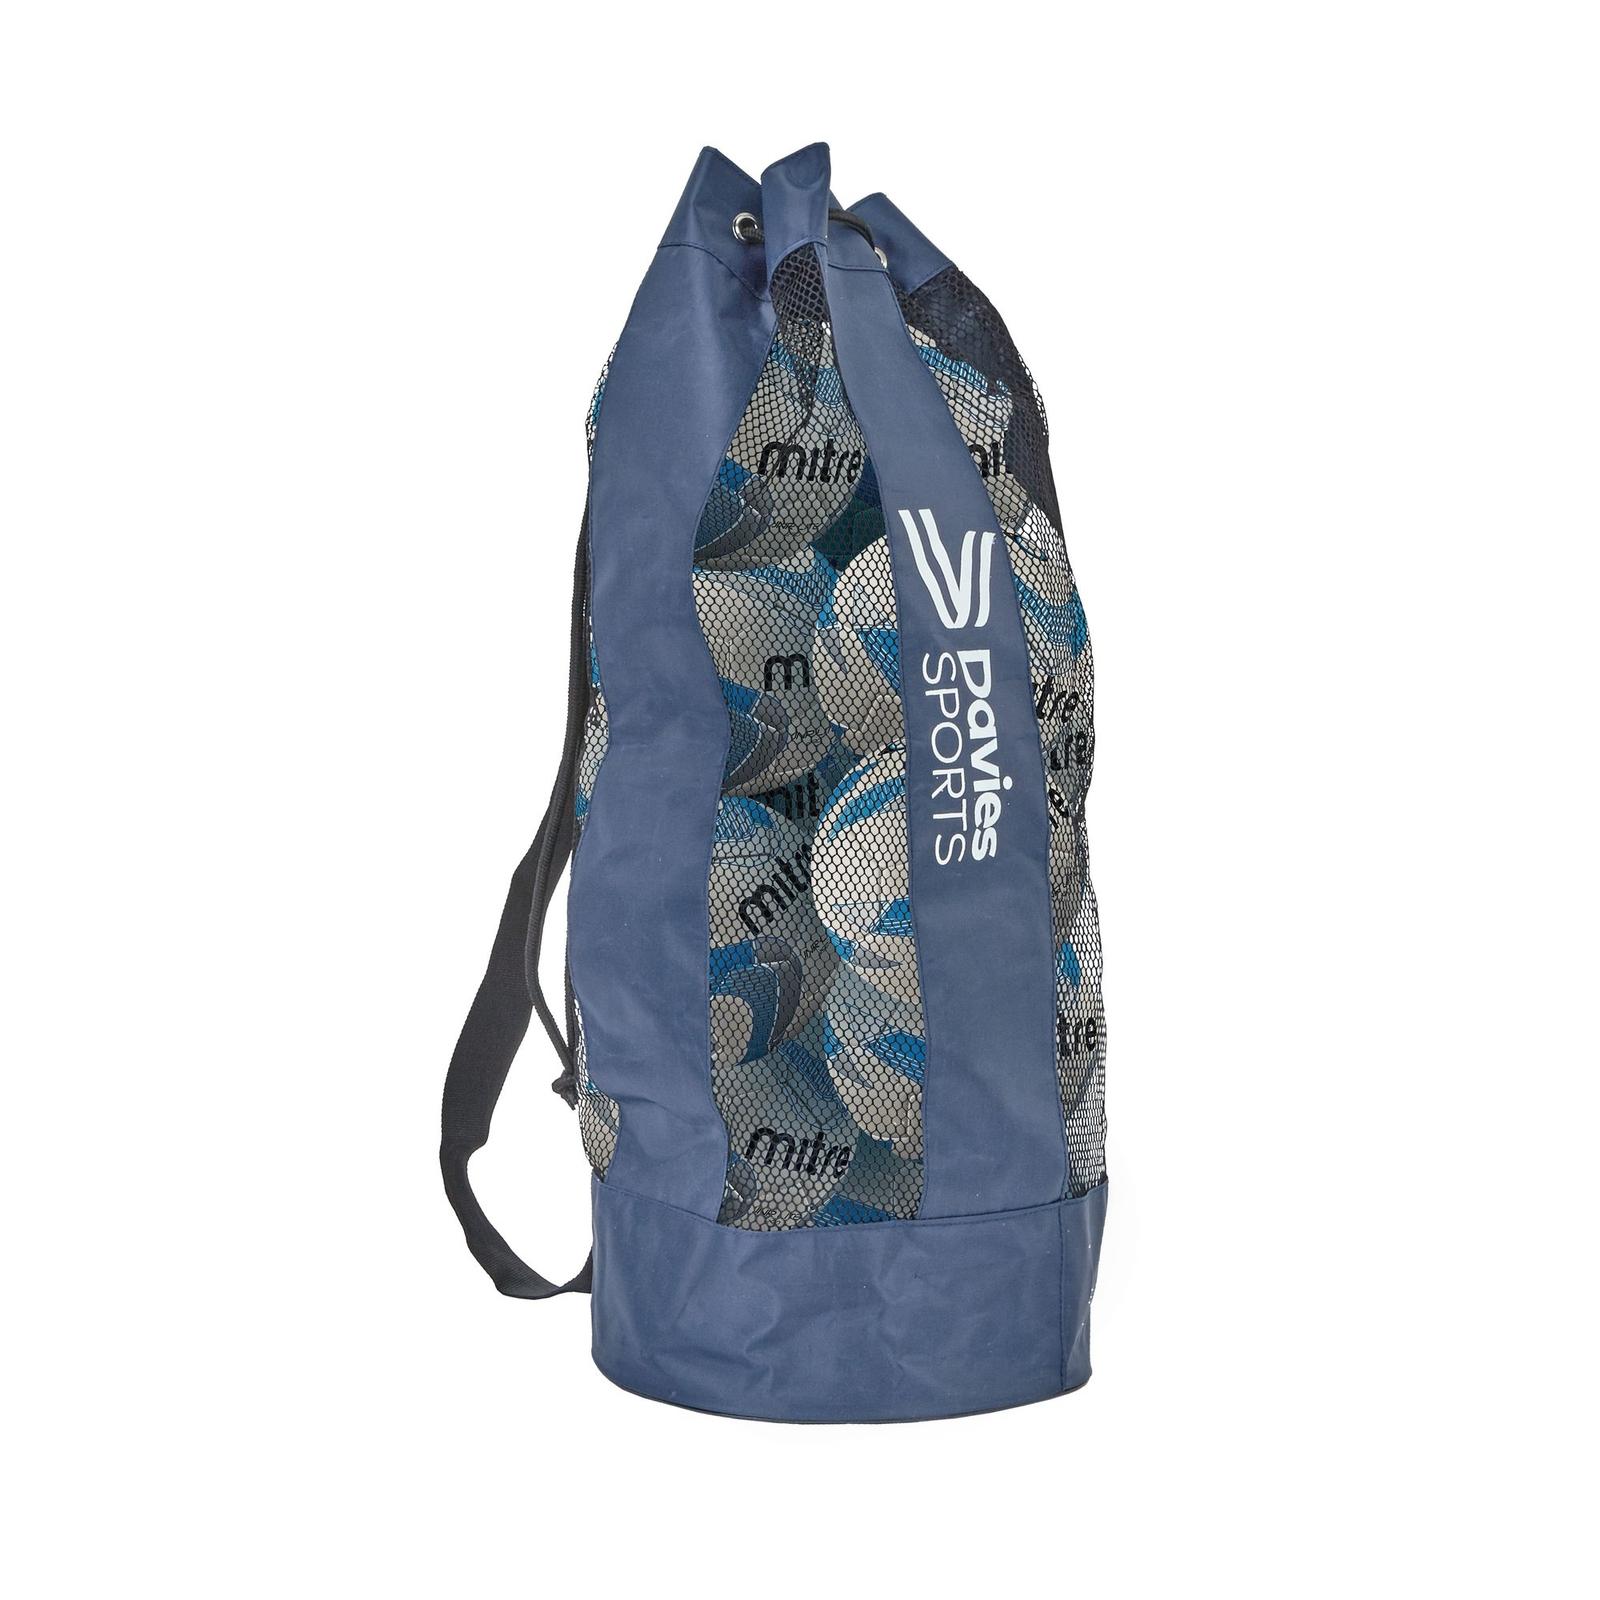 Davies Sports Breathable Bag